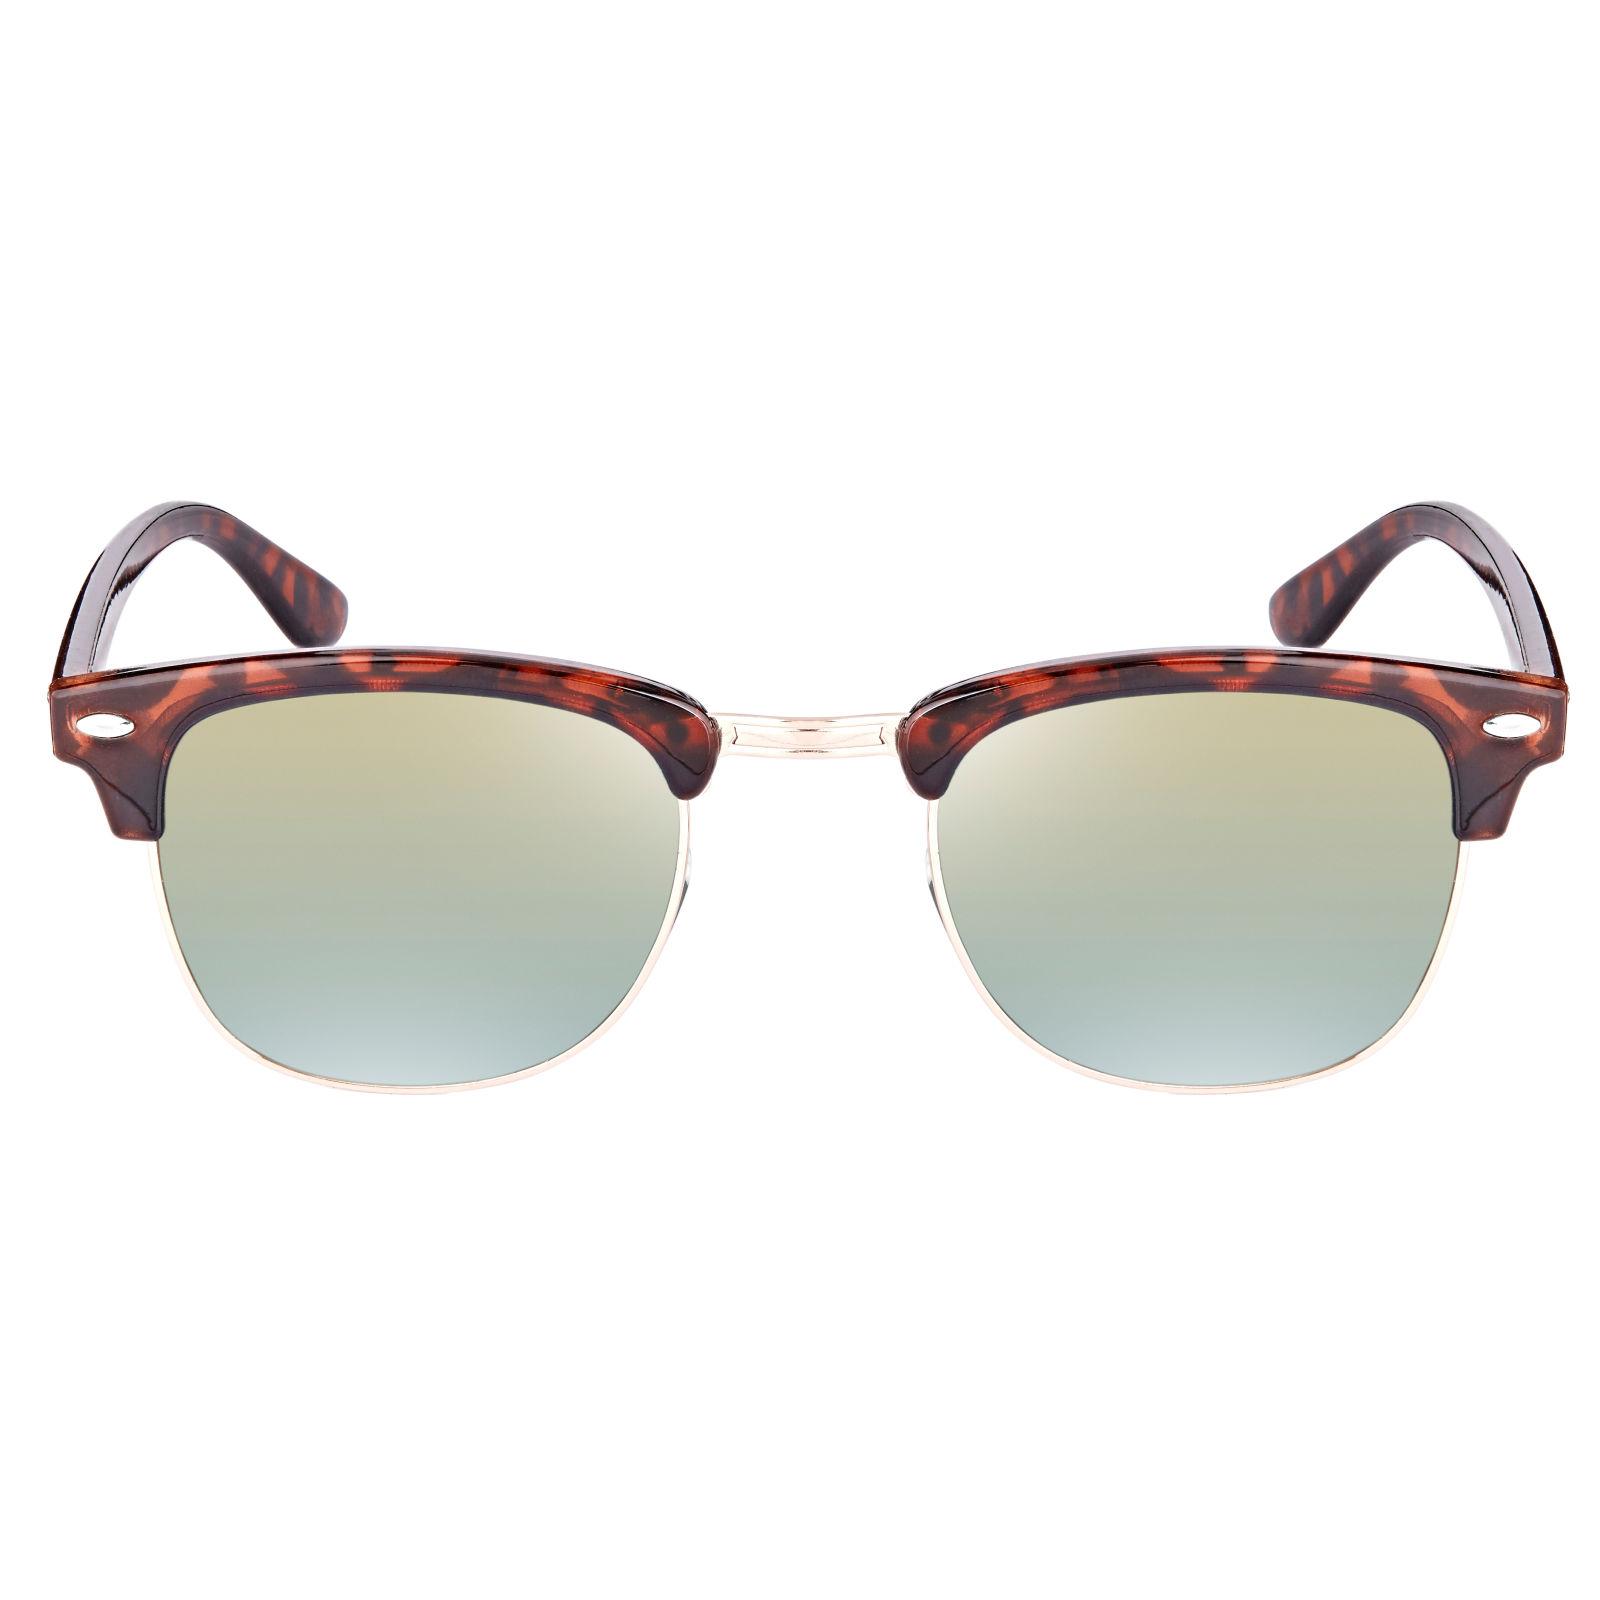 Tortoise Shell Γυαλιά Ηλίου με Mirror Φακούς  3f4ccfb3b81